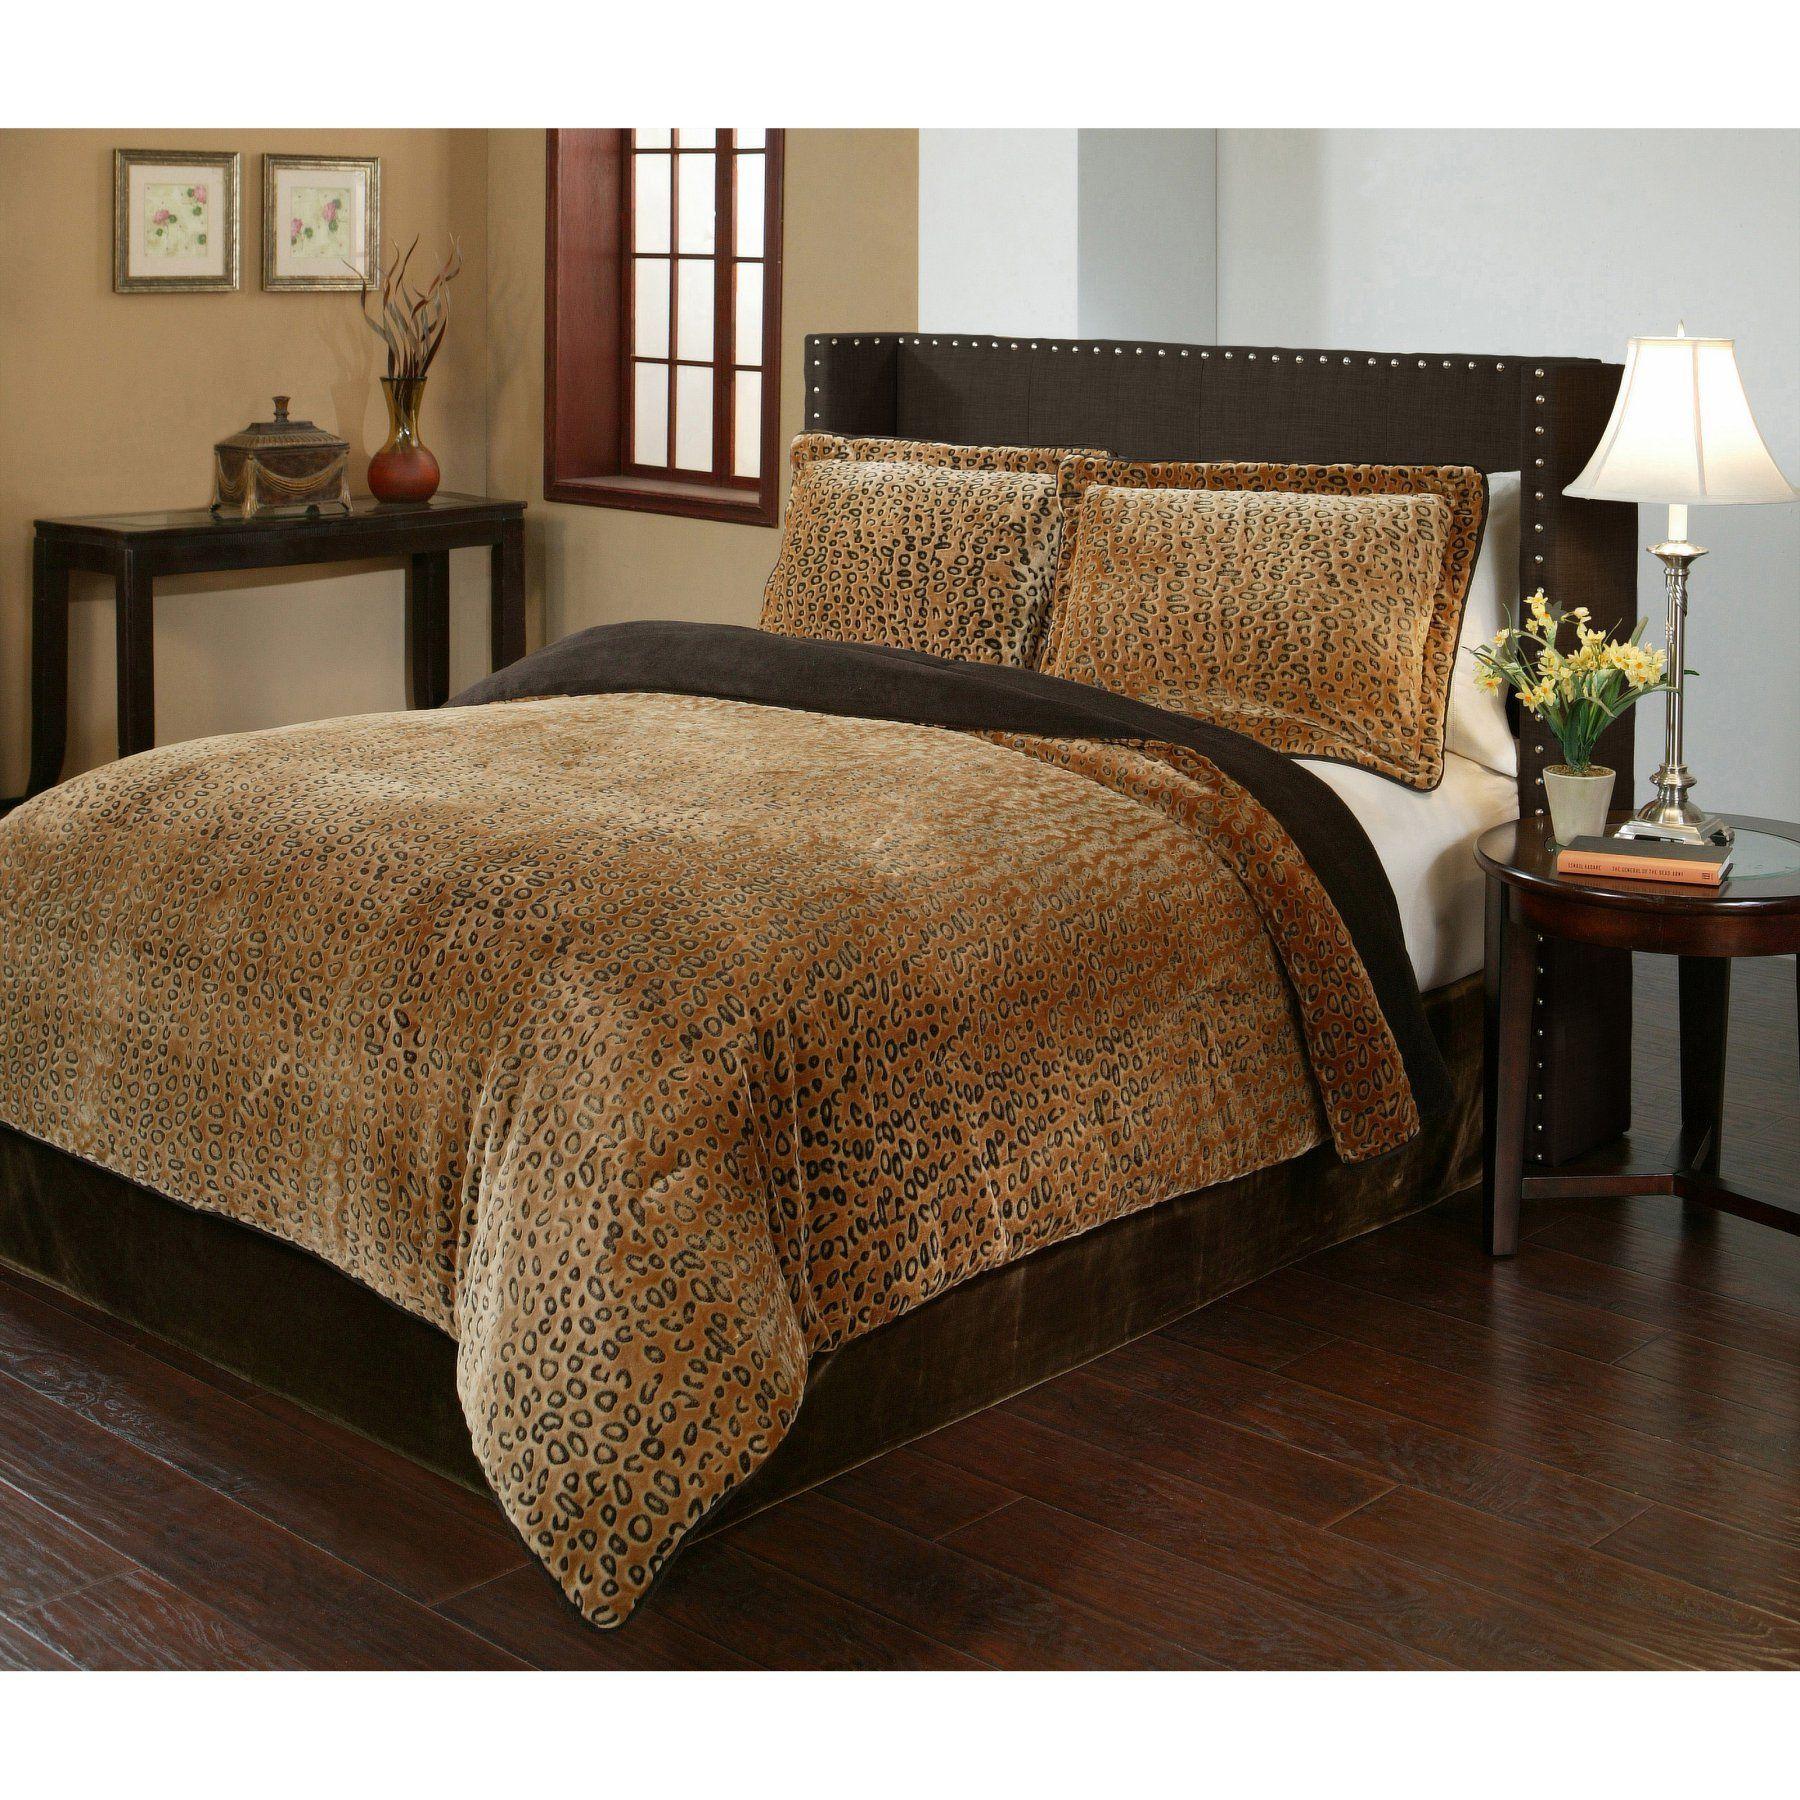 Cheetah 3 Piece Velvet Plush Printed Comforter Set By Fraiche